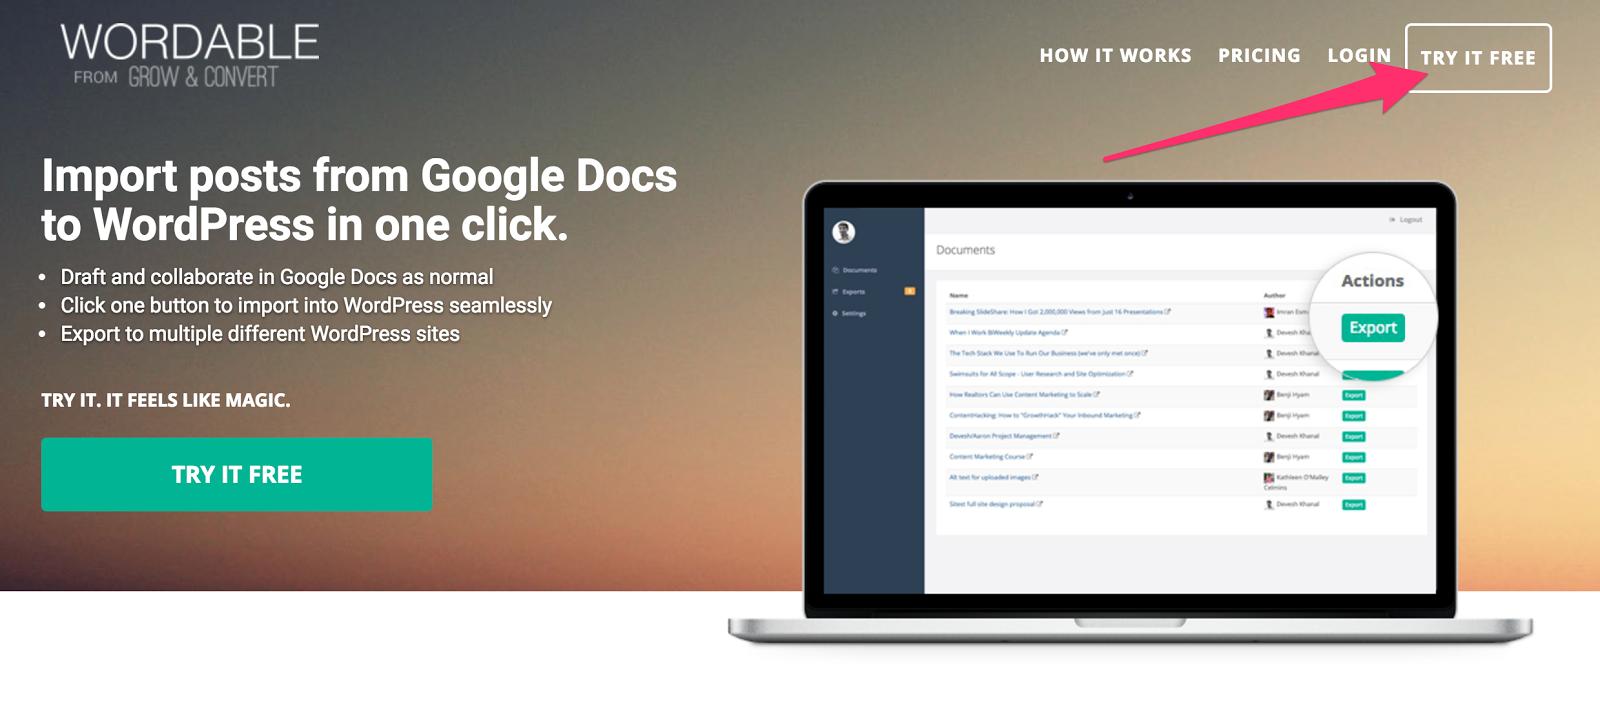 Google-docs-wordpress-wordable